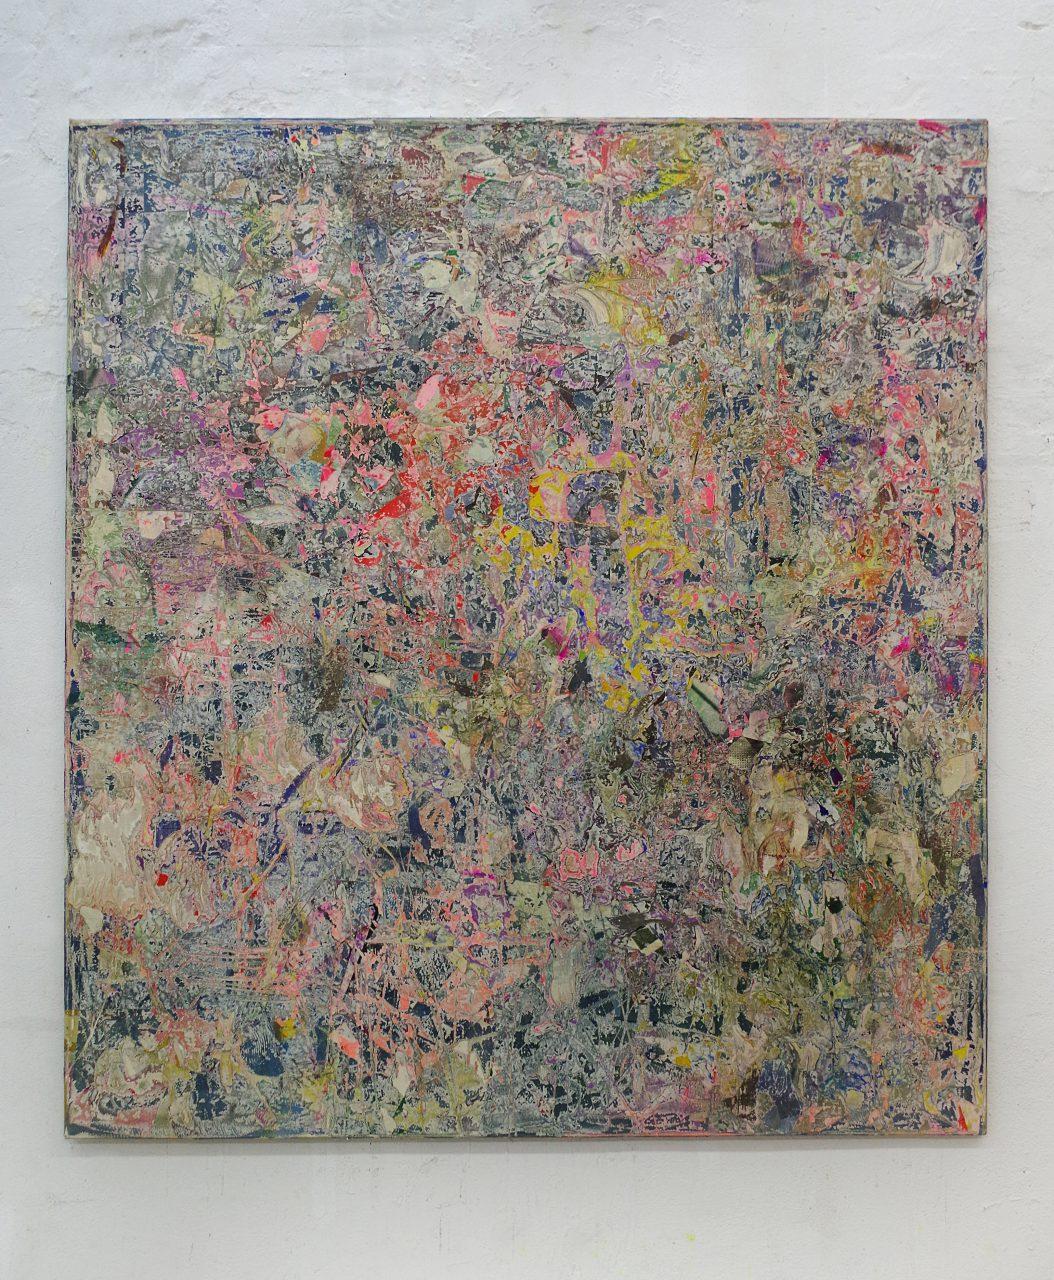 2017, Acryl, Spraypaint, Papier, Leinwand, Keilrahmen 200 x 180 cm